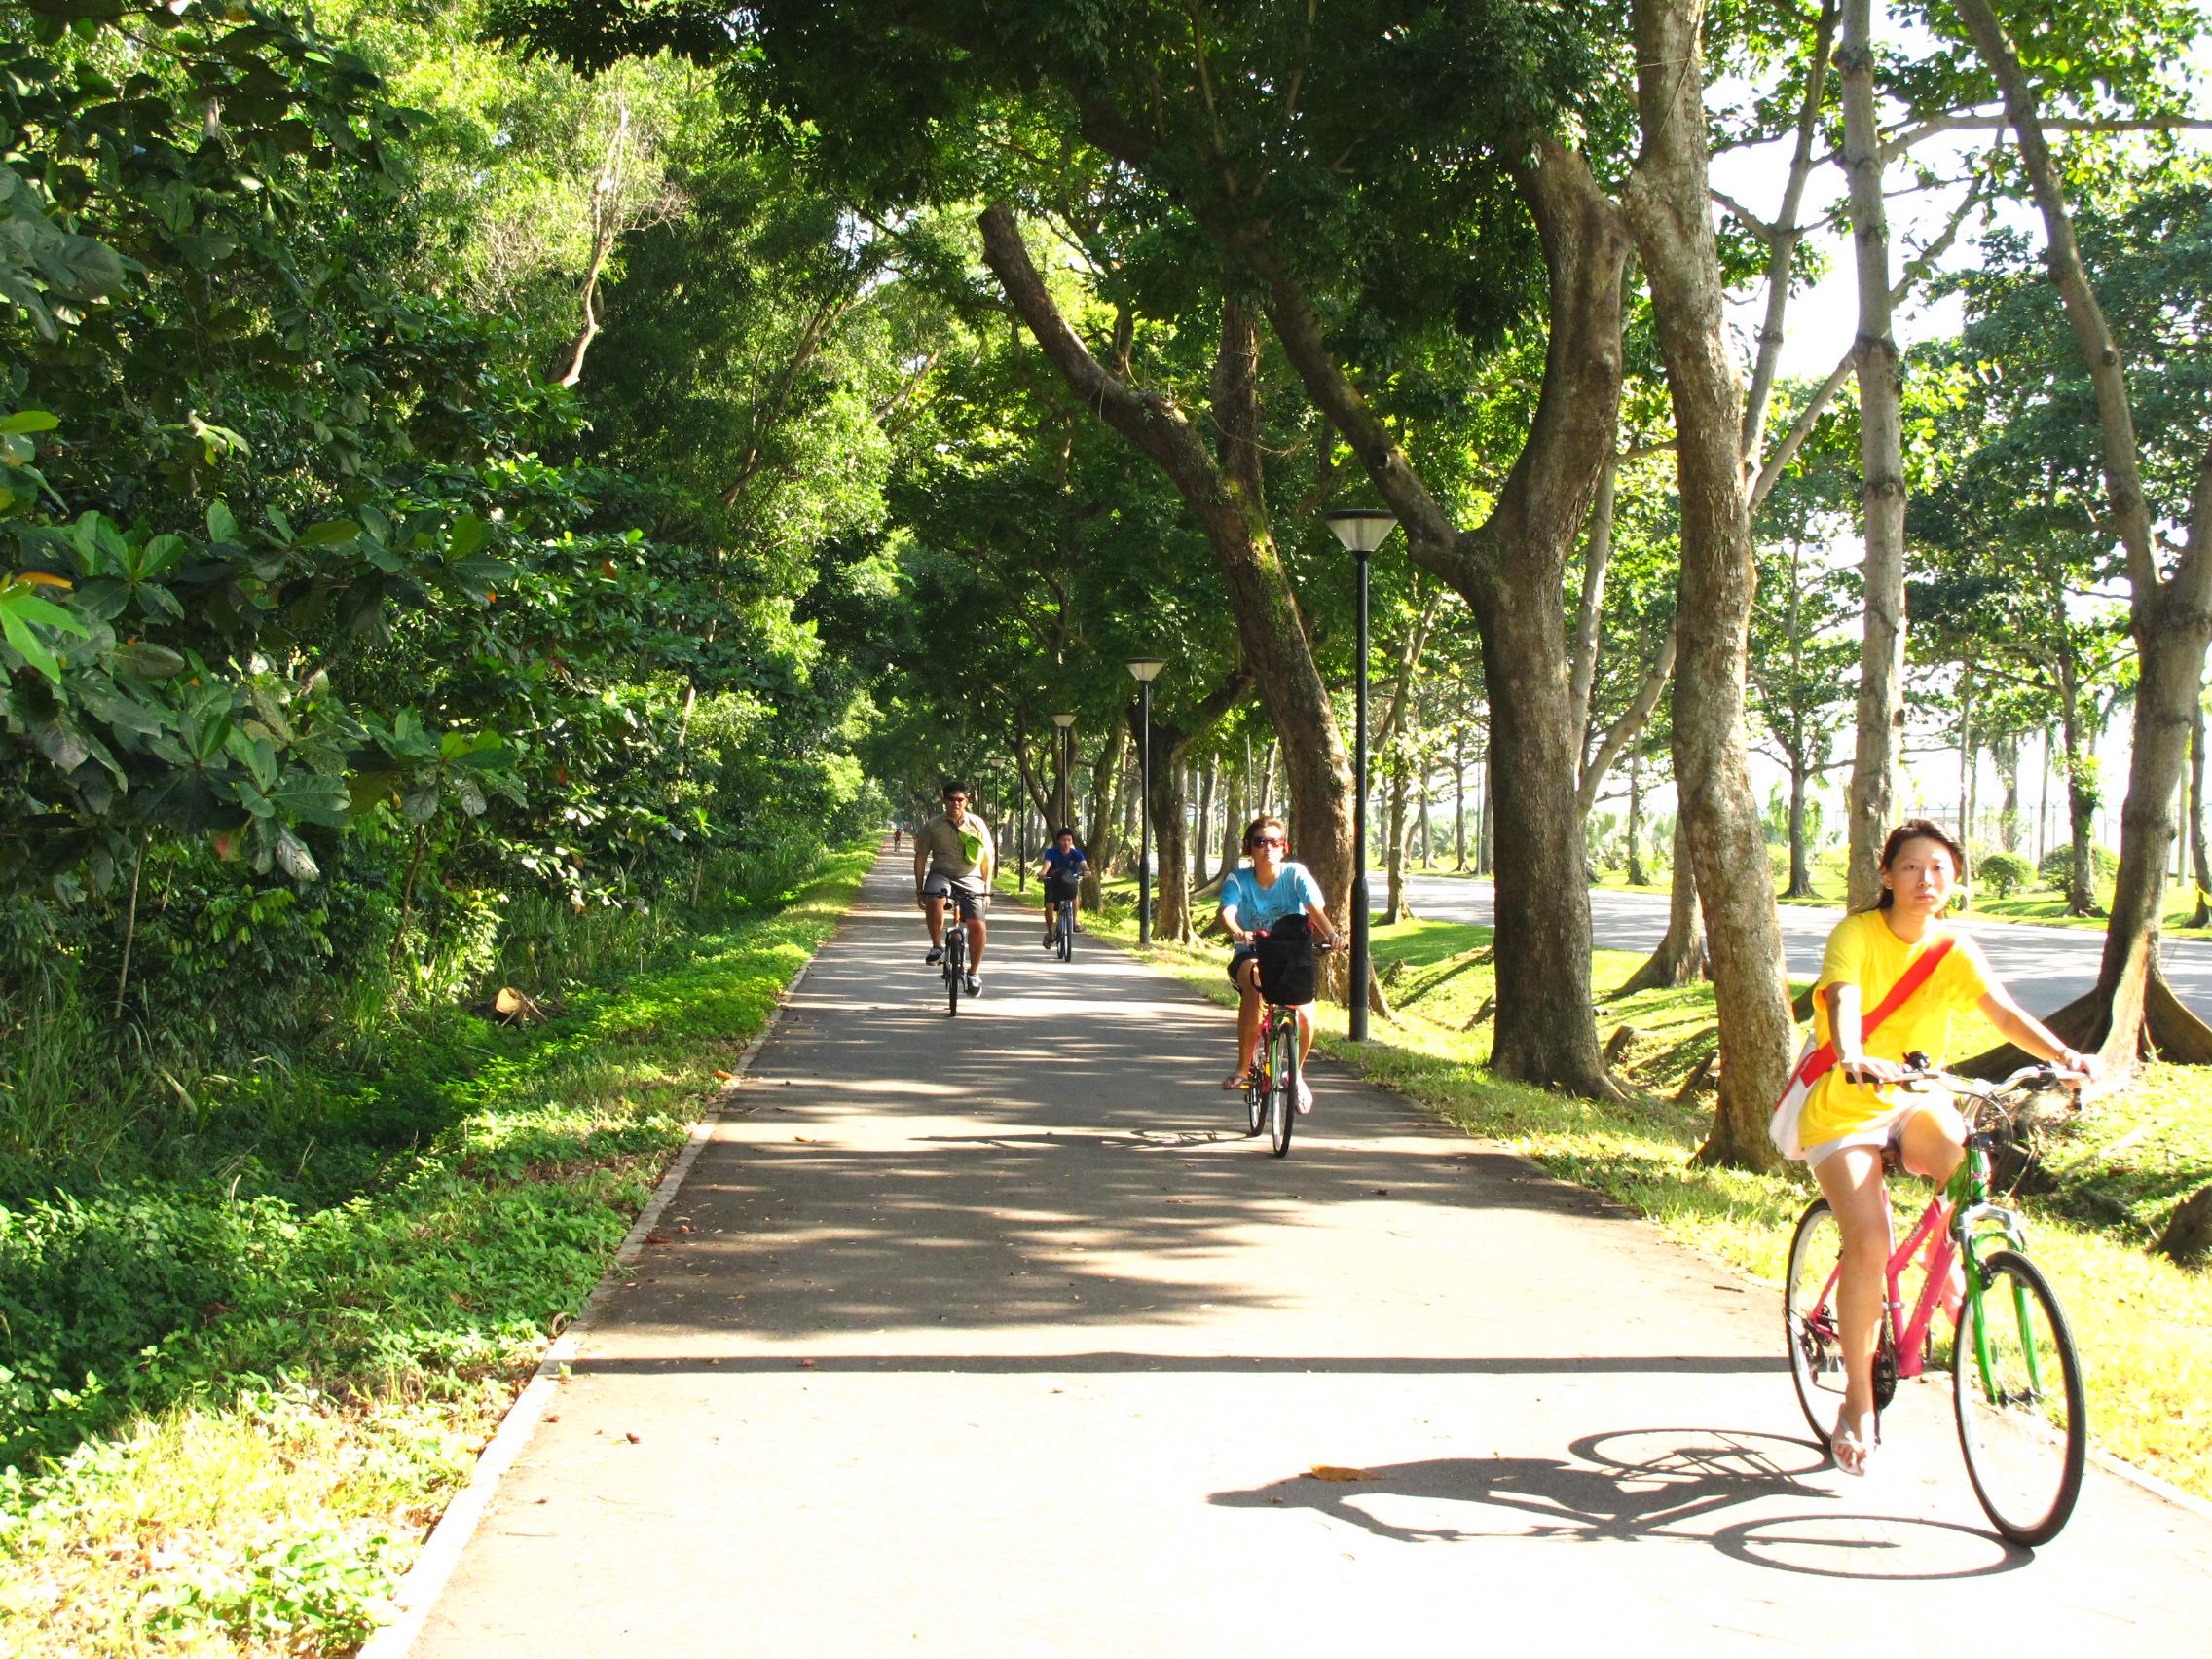 Coastal Road Park Connector is one stop on the Eastern Coastal Loop.